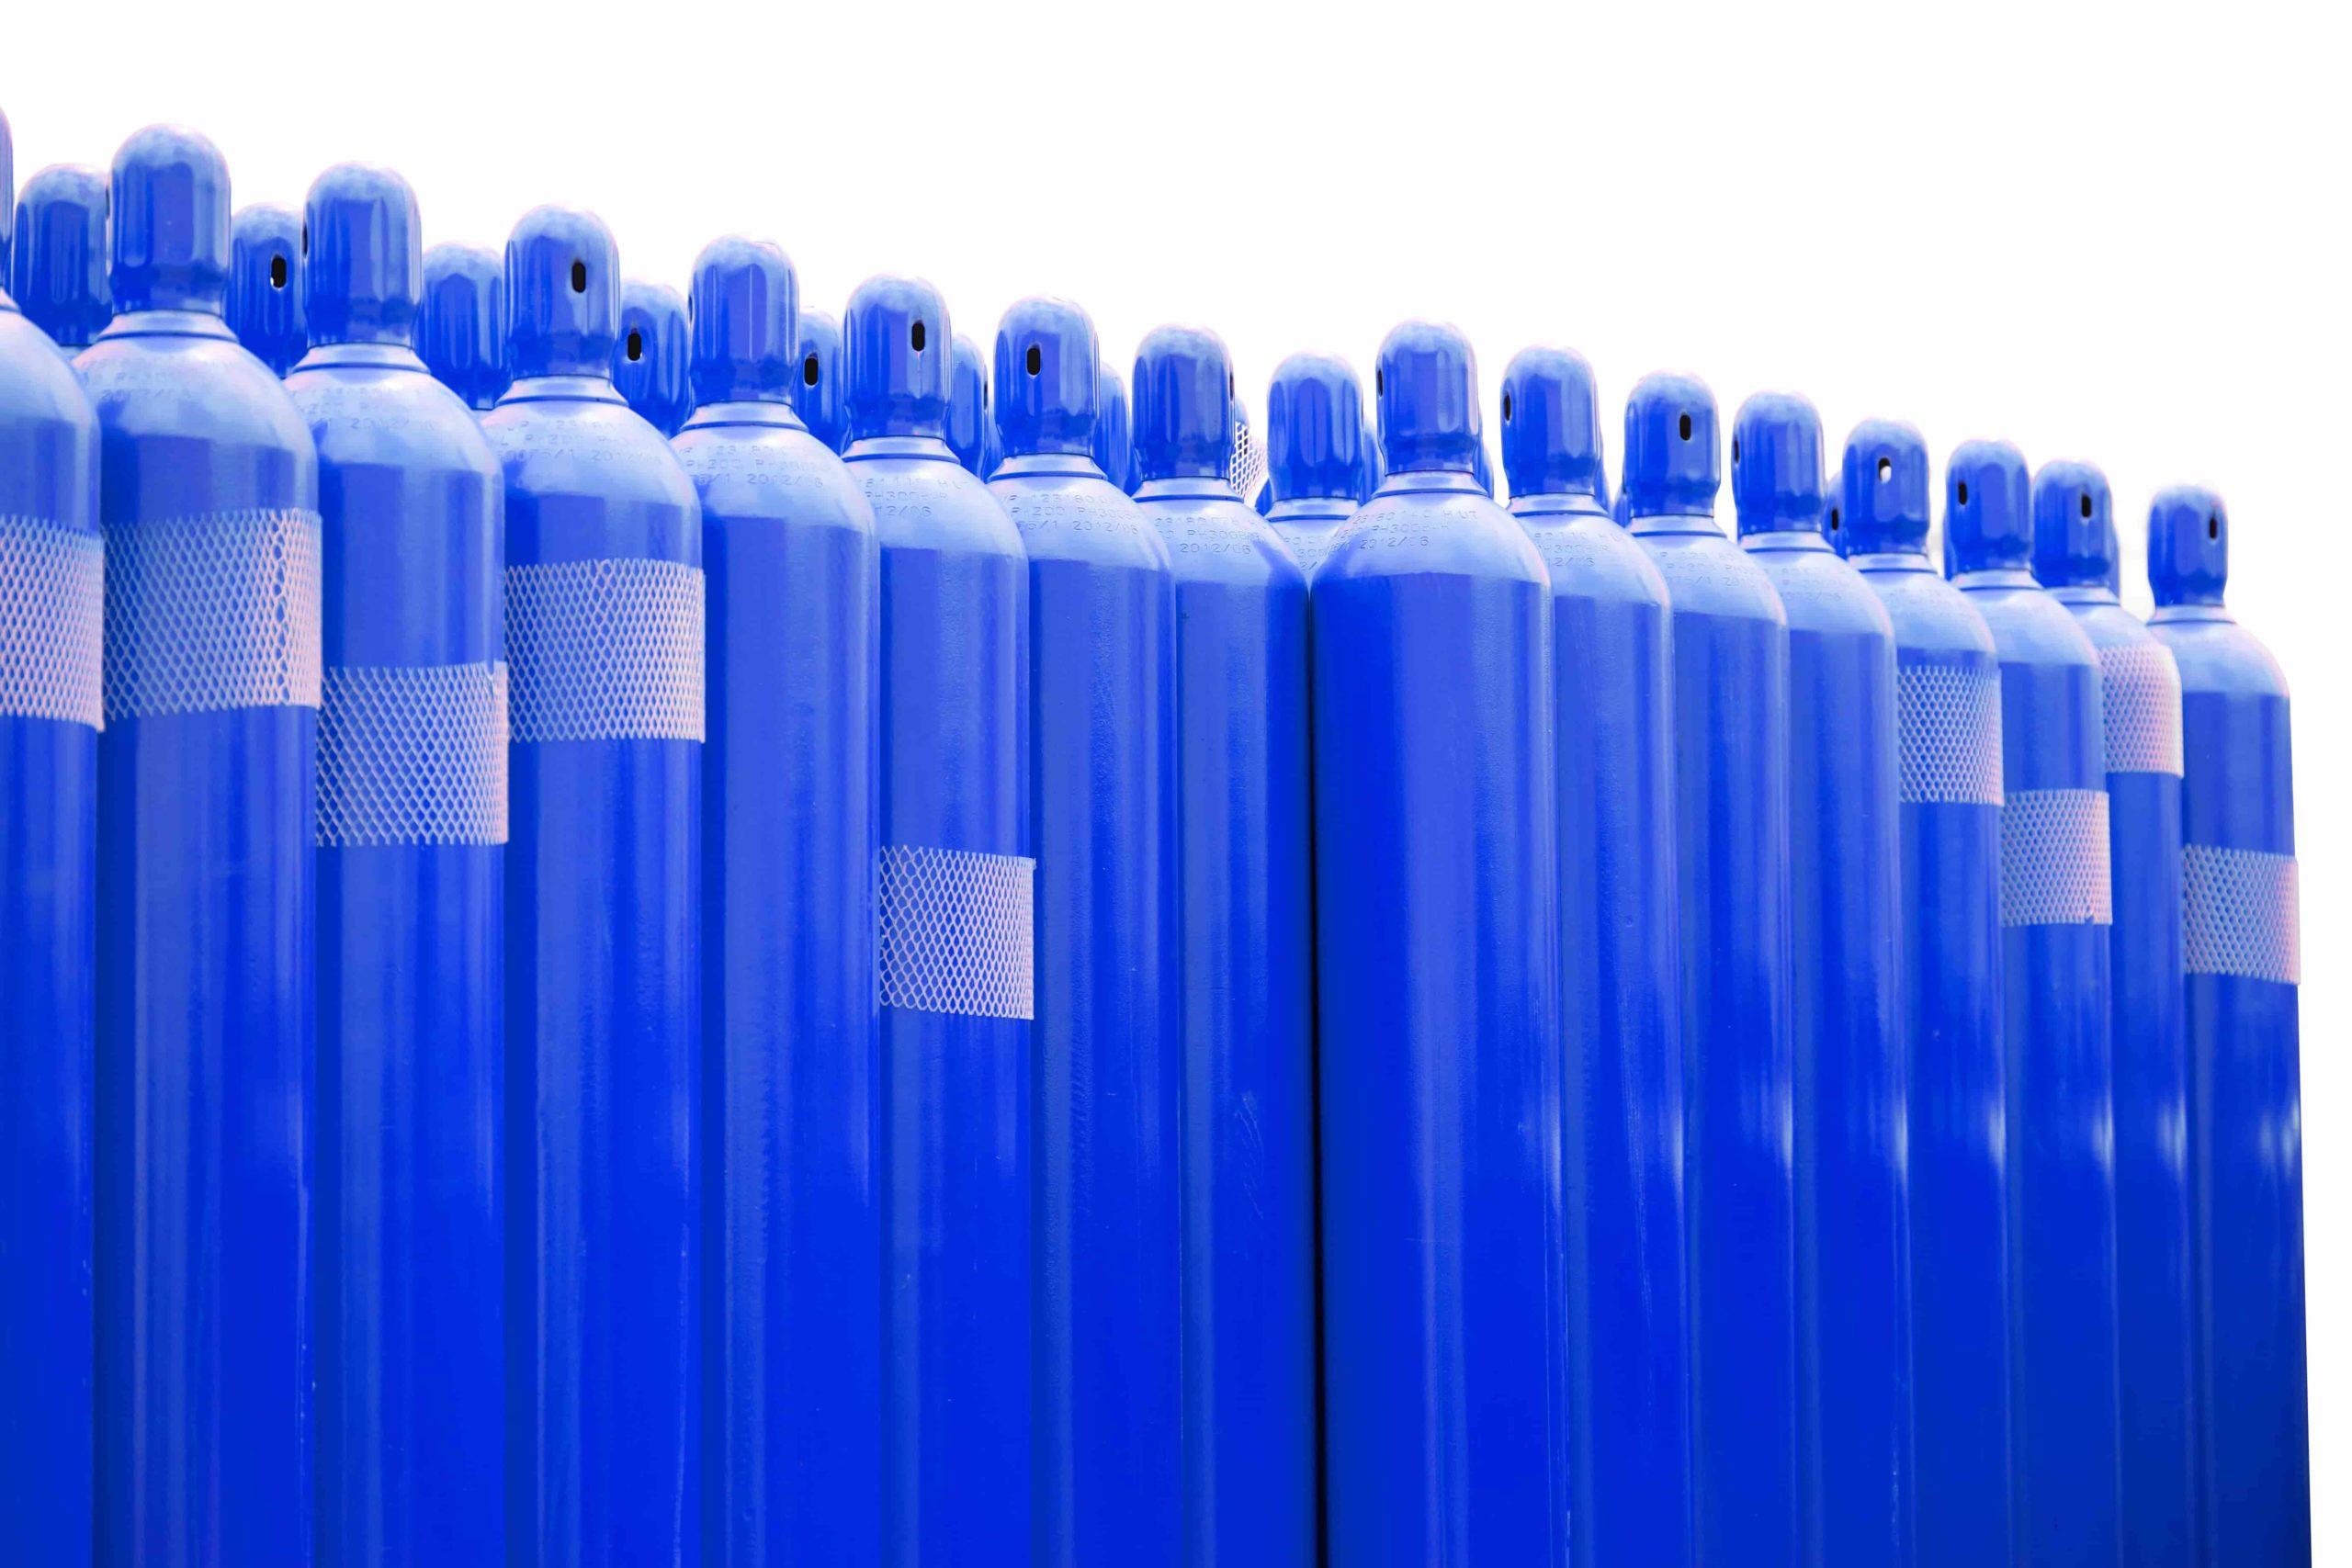 neubauten Wasserstofftanks